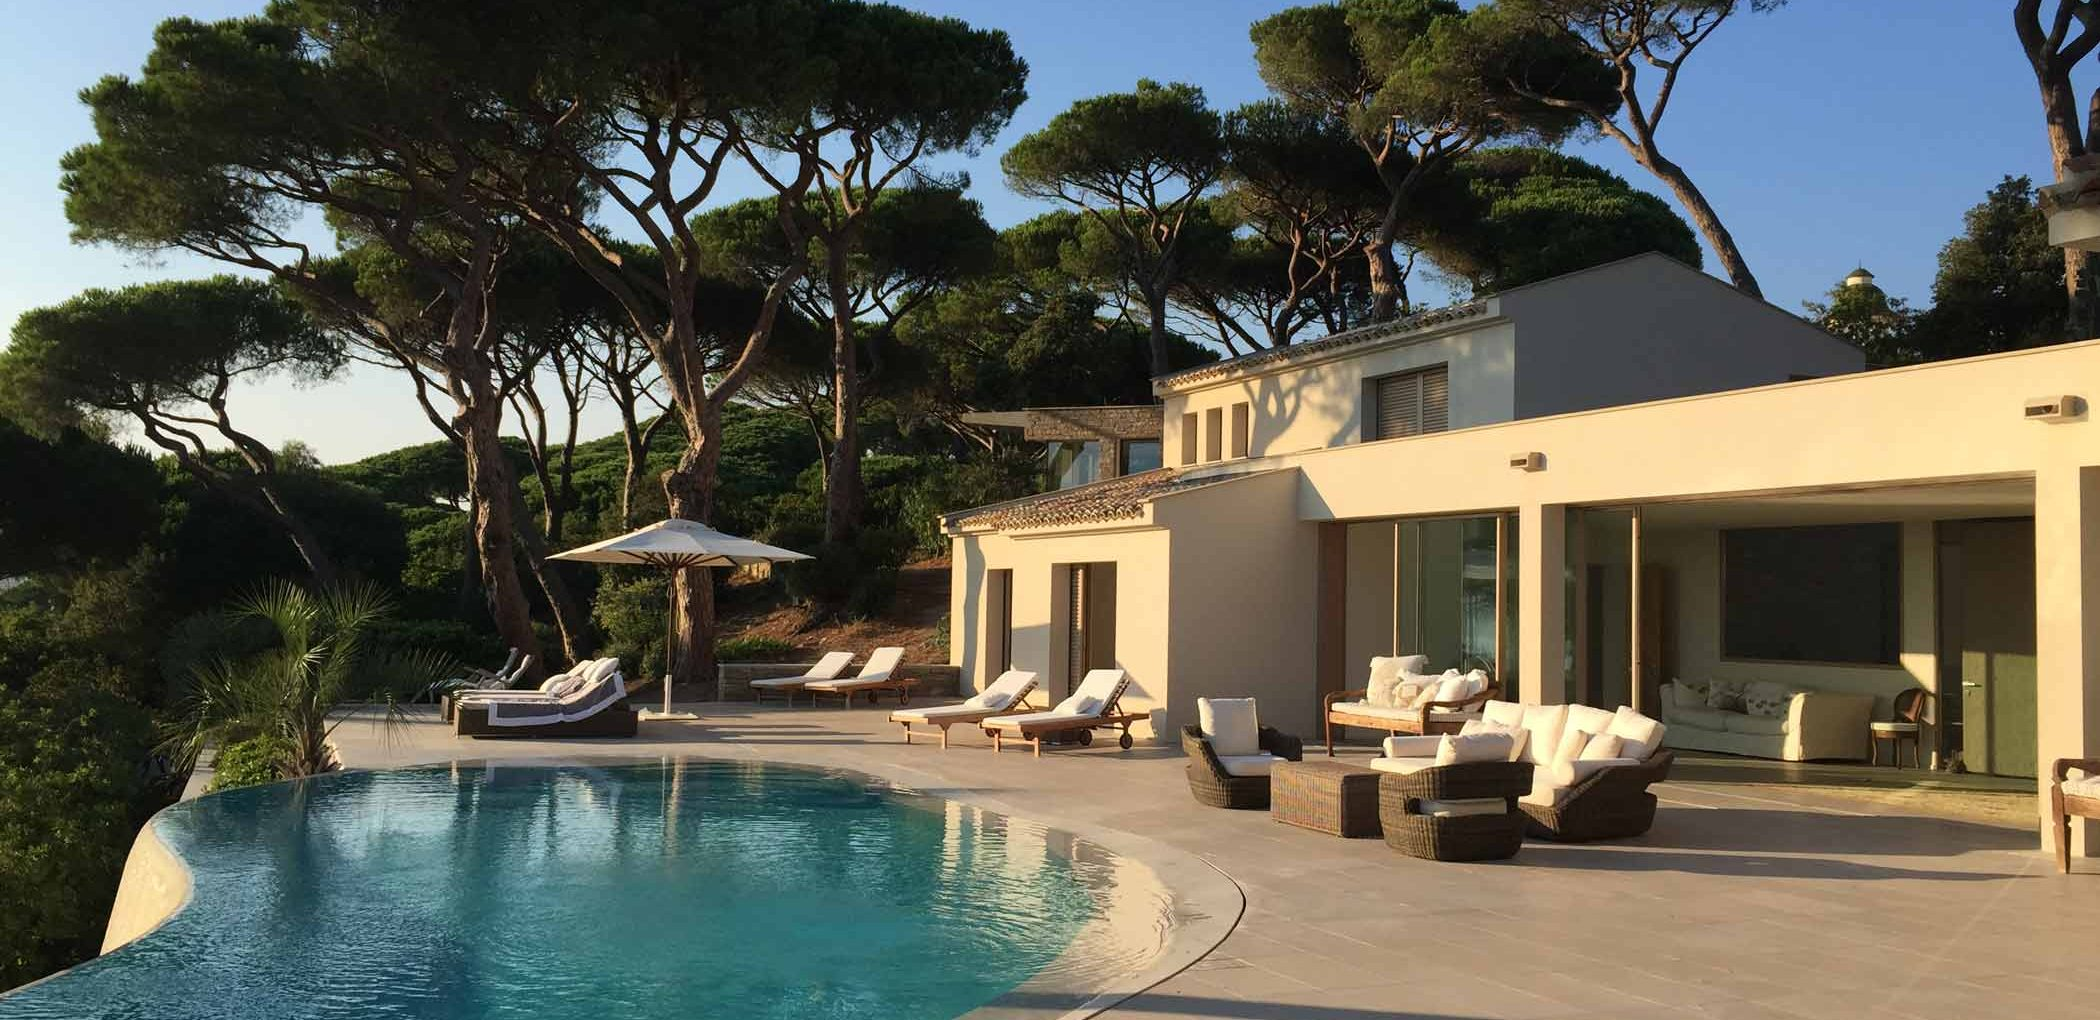 View of Villa Saint Tropez with wooden lift and slide doors